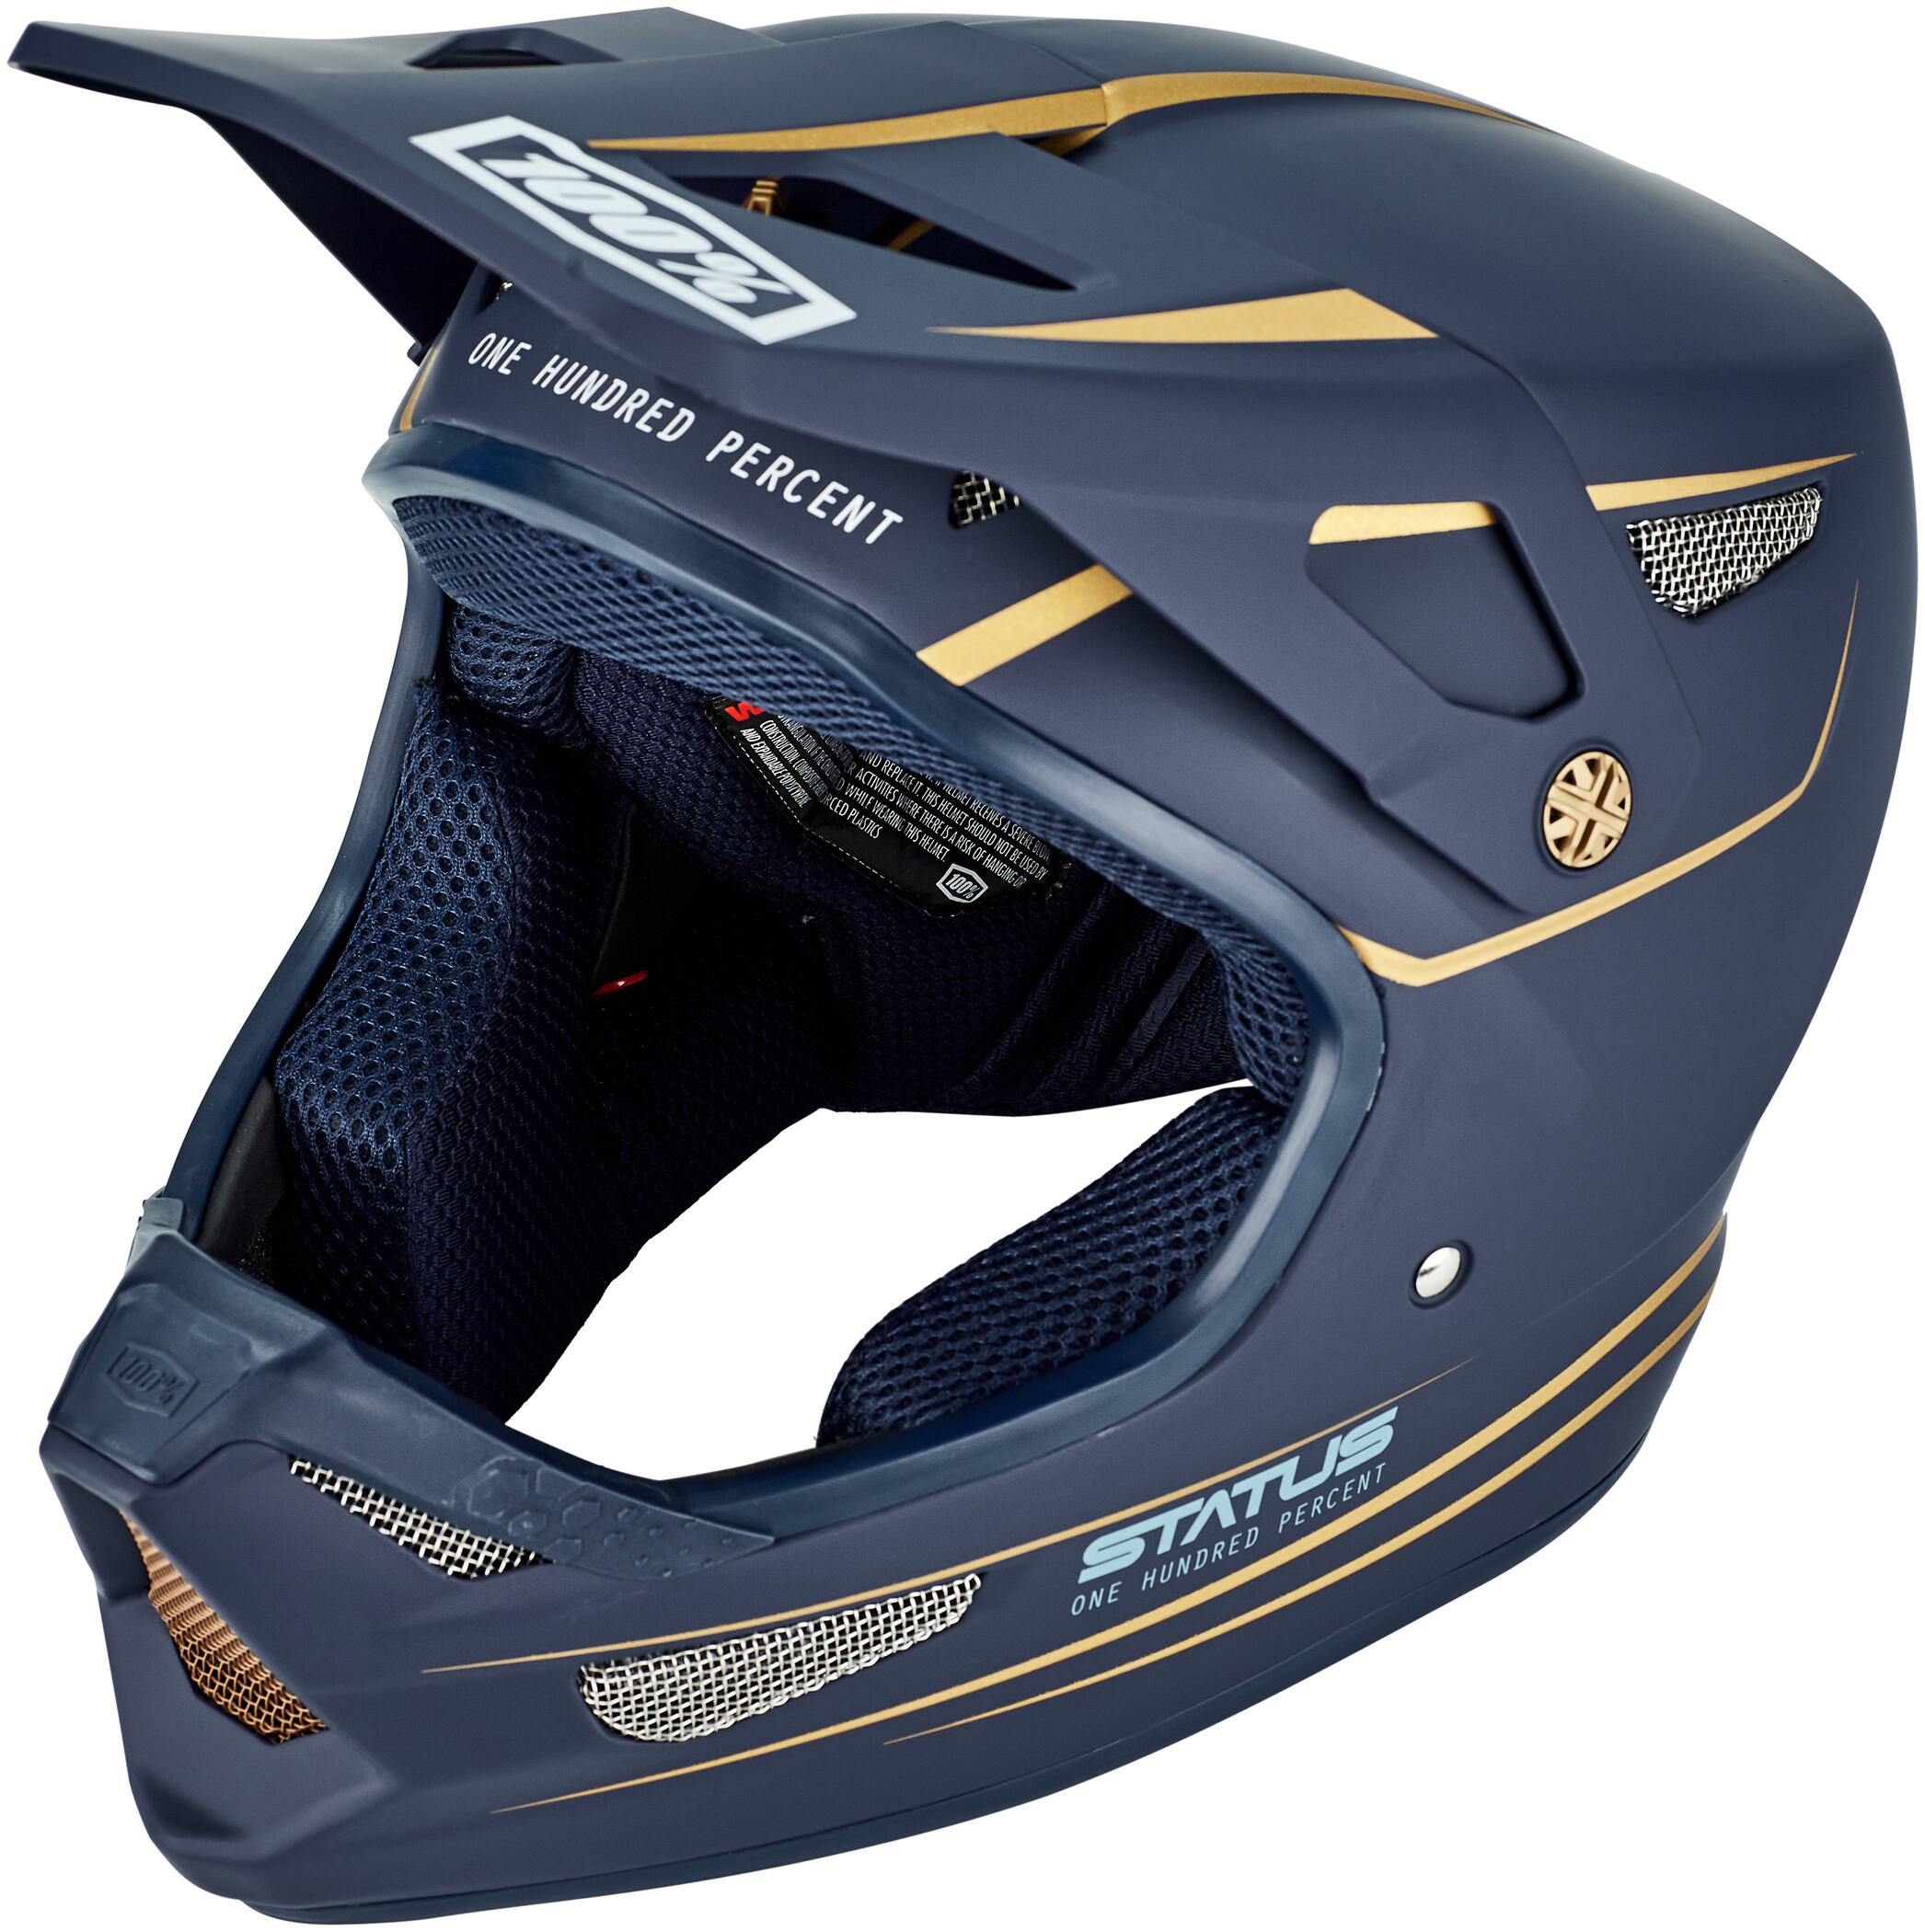 100% Status DH/BMX Helmet | Hjelme